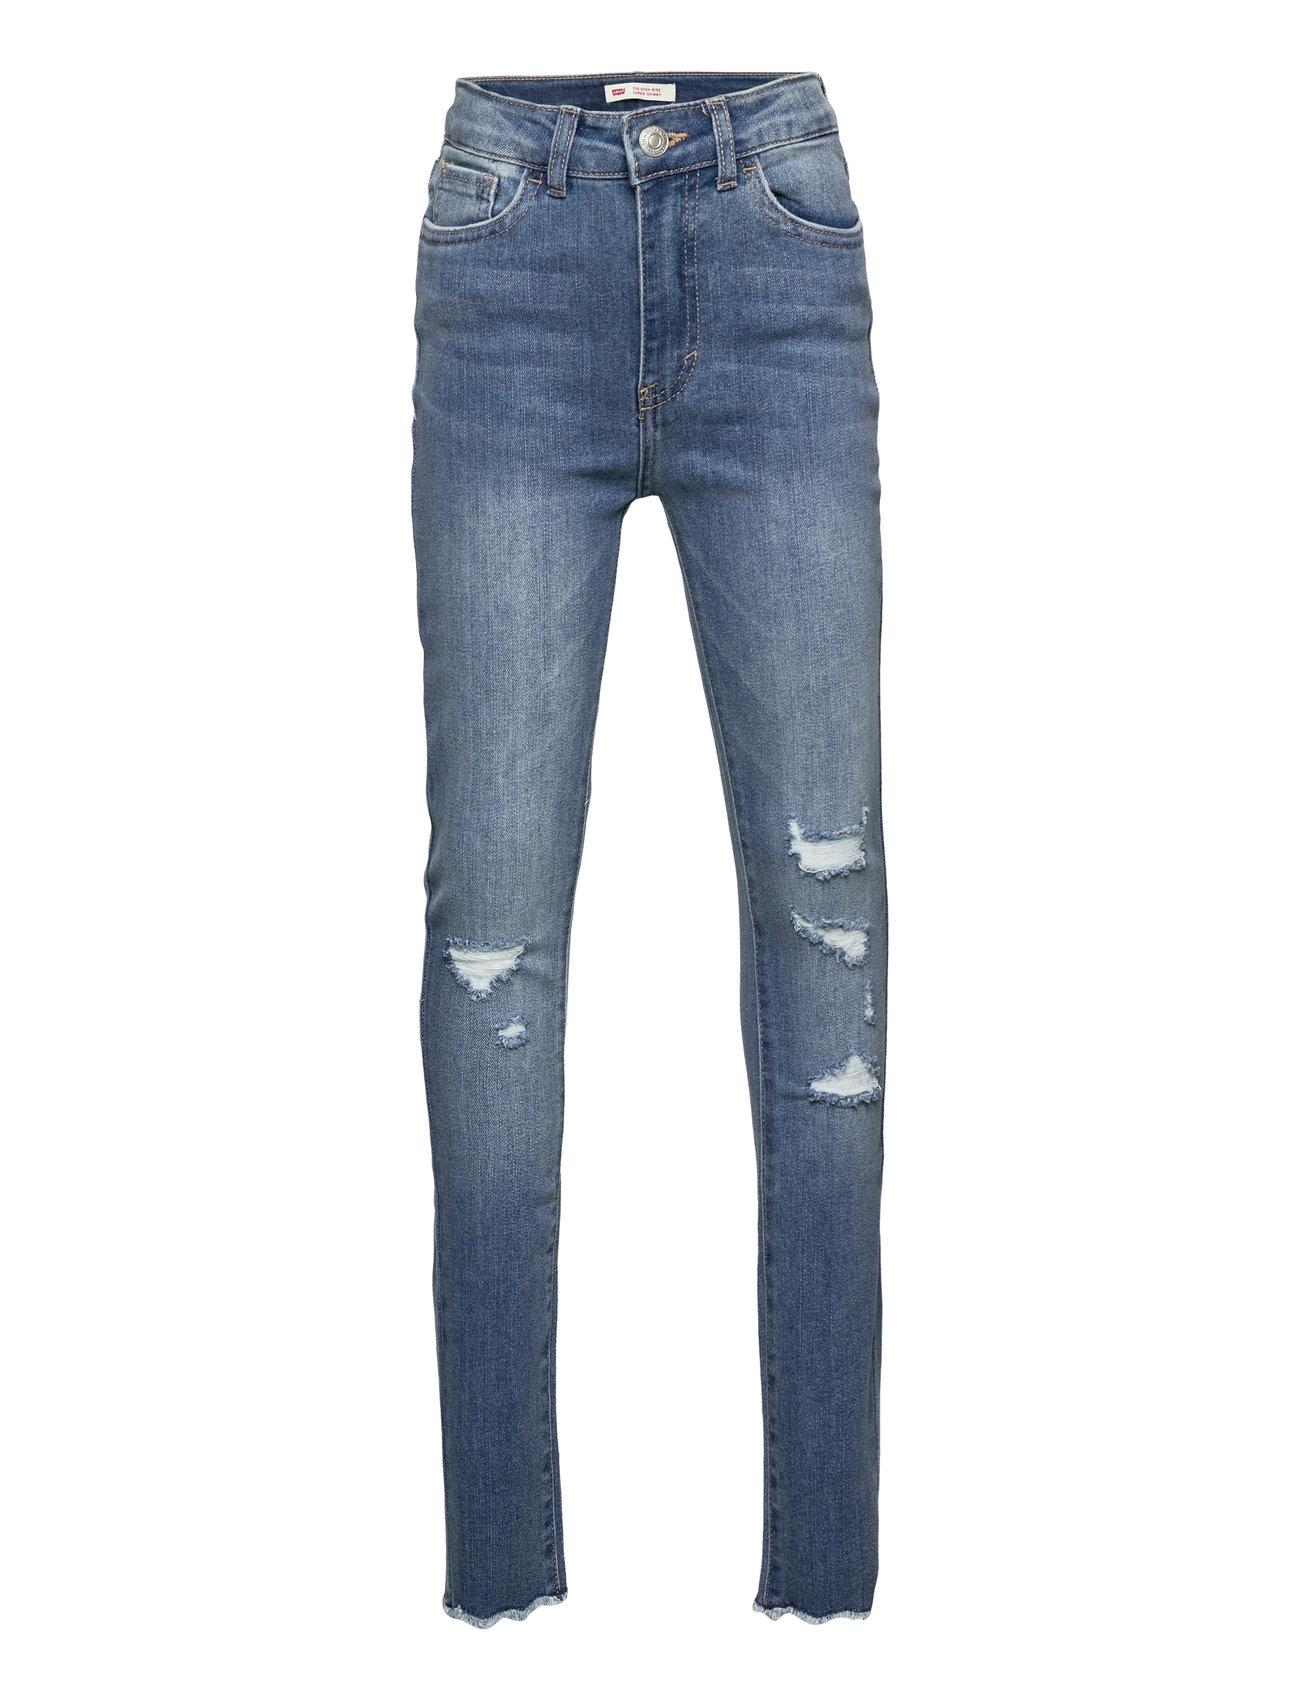 Levi's - LVG 720 HIGH RISE SUPER SKINNY - jeans - hometown blue - 0